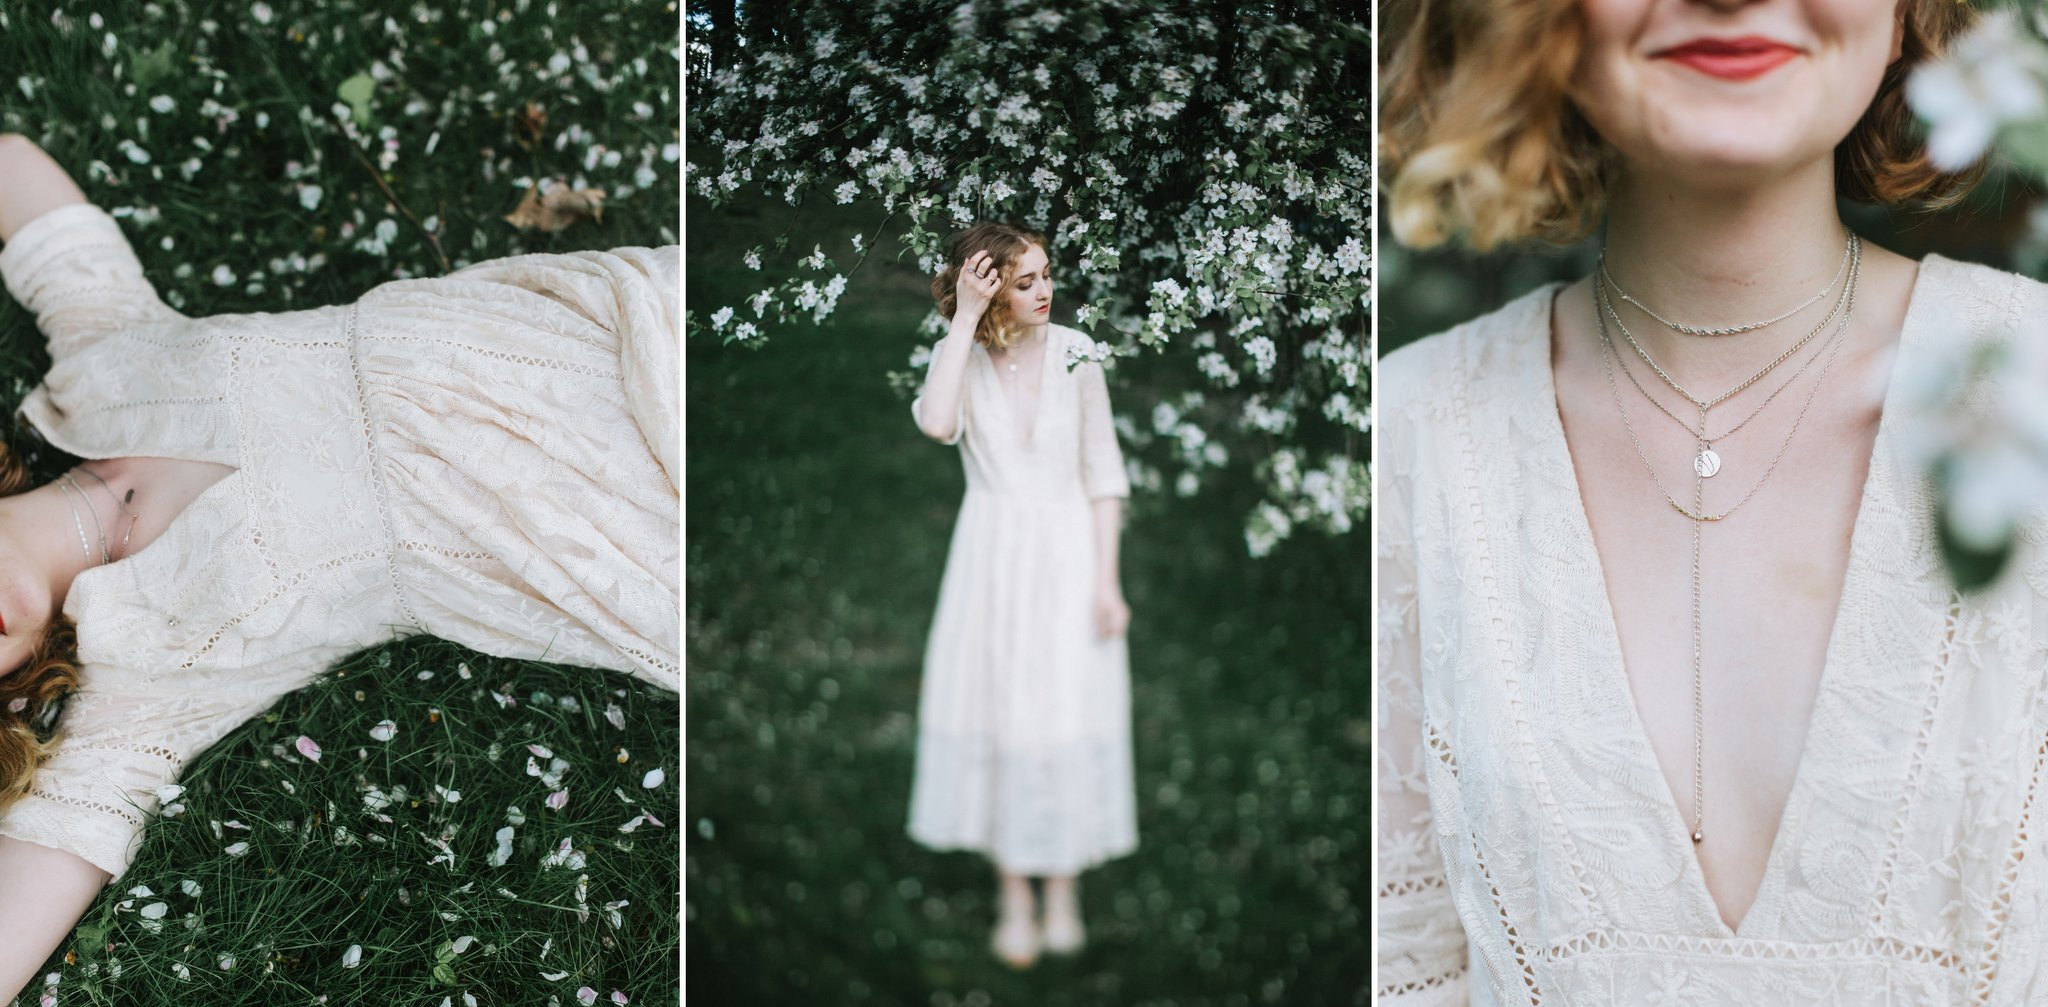 Spring_Fashion_Cherry_Blossom_NYC_3.jpg